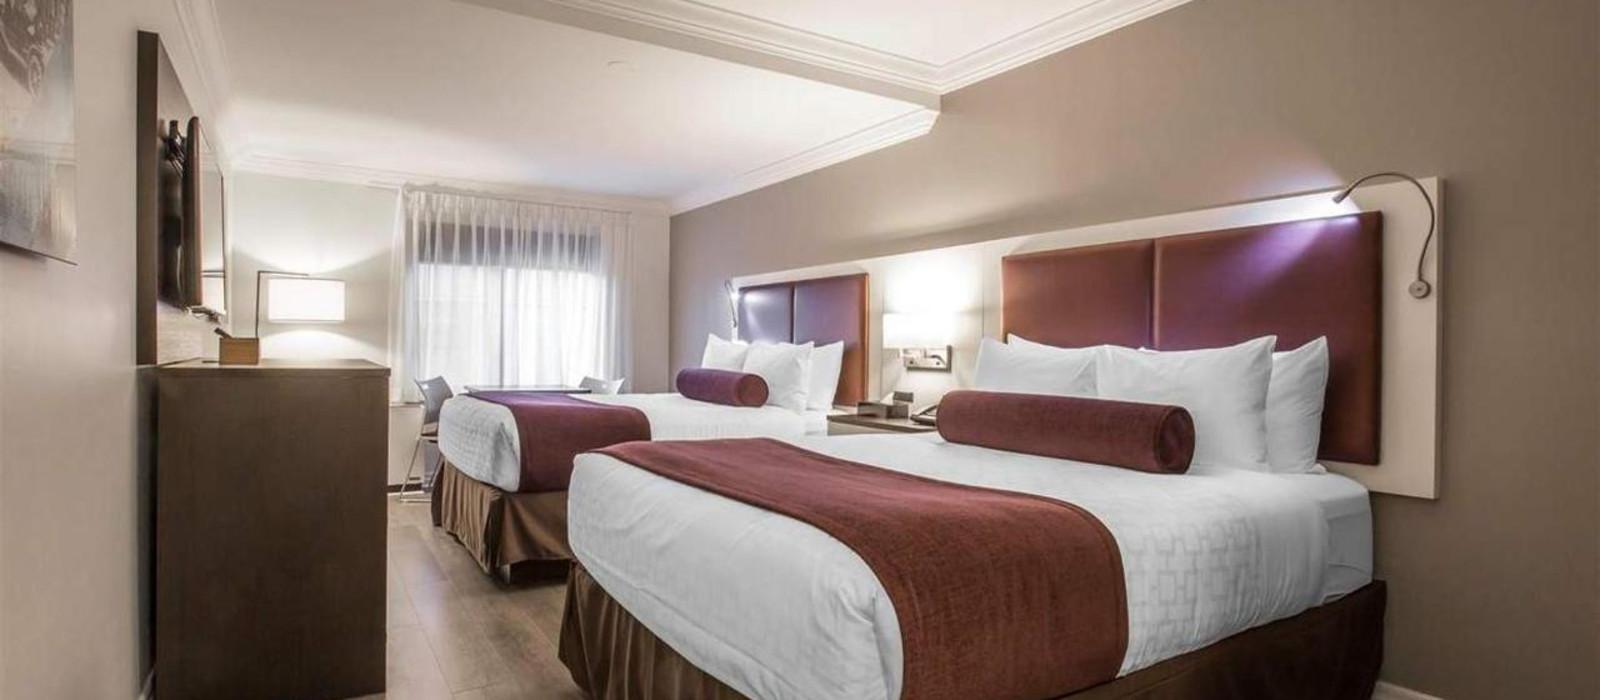 Hotel Saint James  Kanada